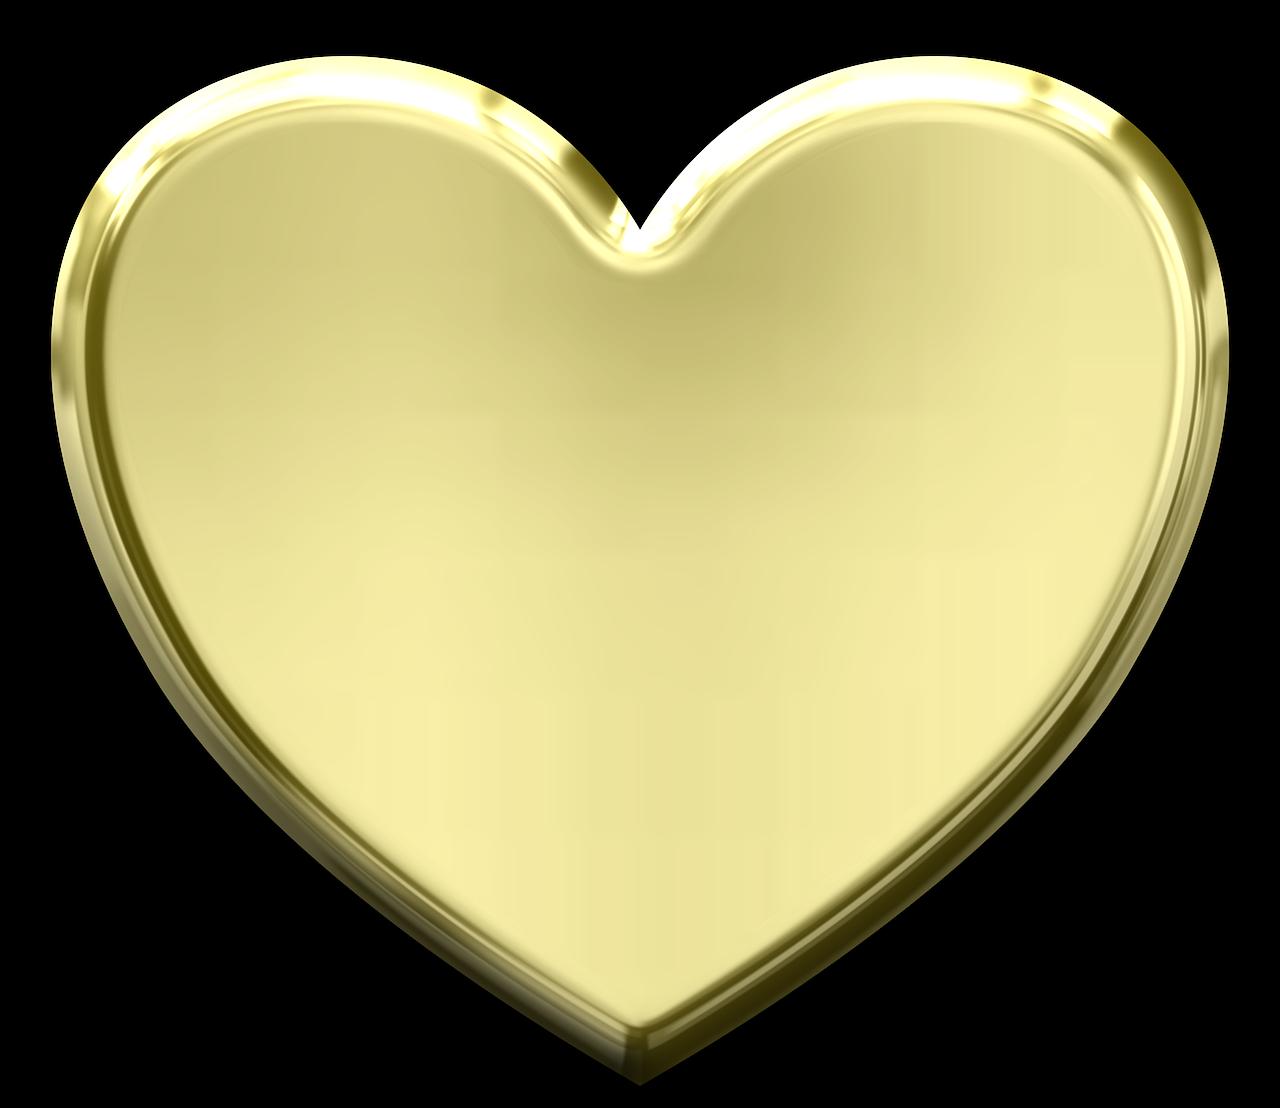 Serce Metaliczny Valentine Milosc Metalowe Zlota Alphabet Images Golden Heart Heart Shapes